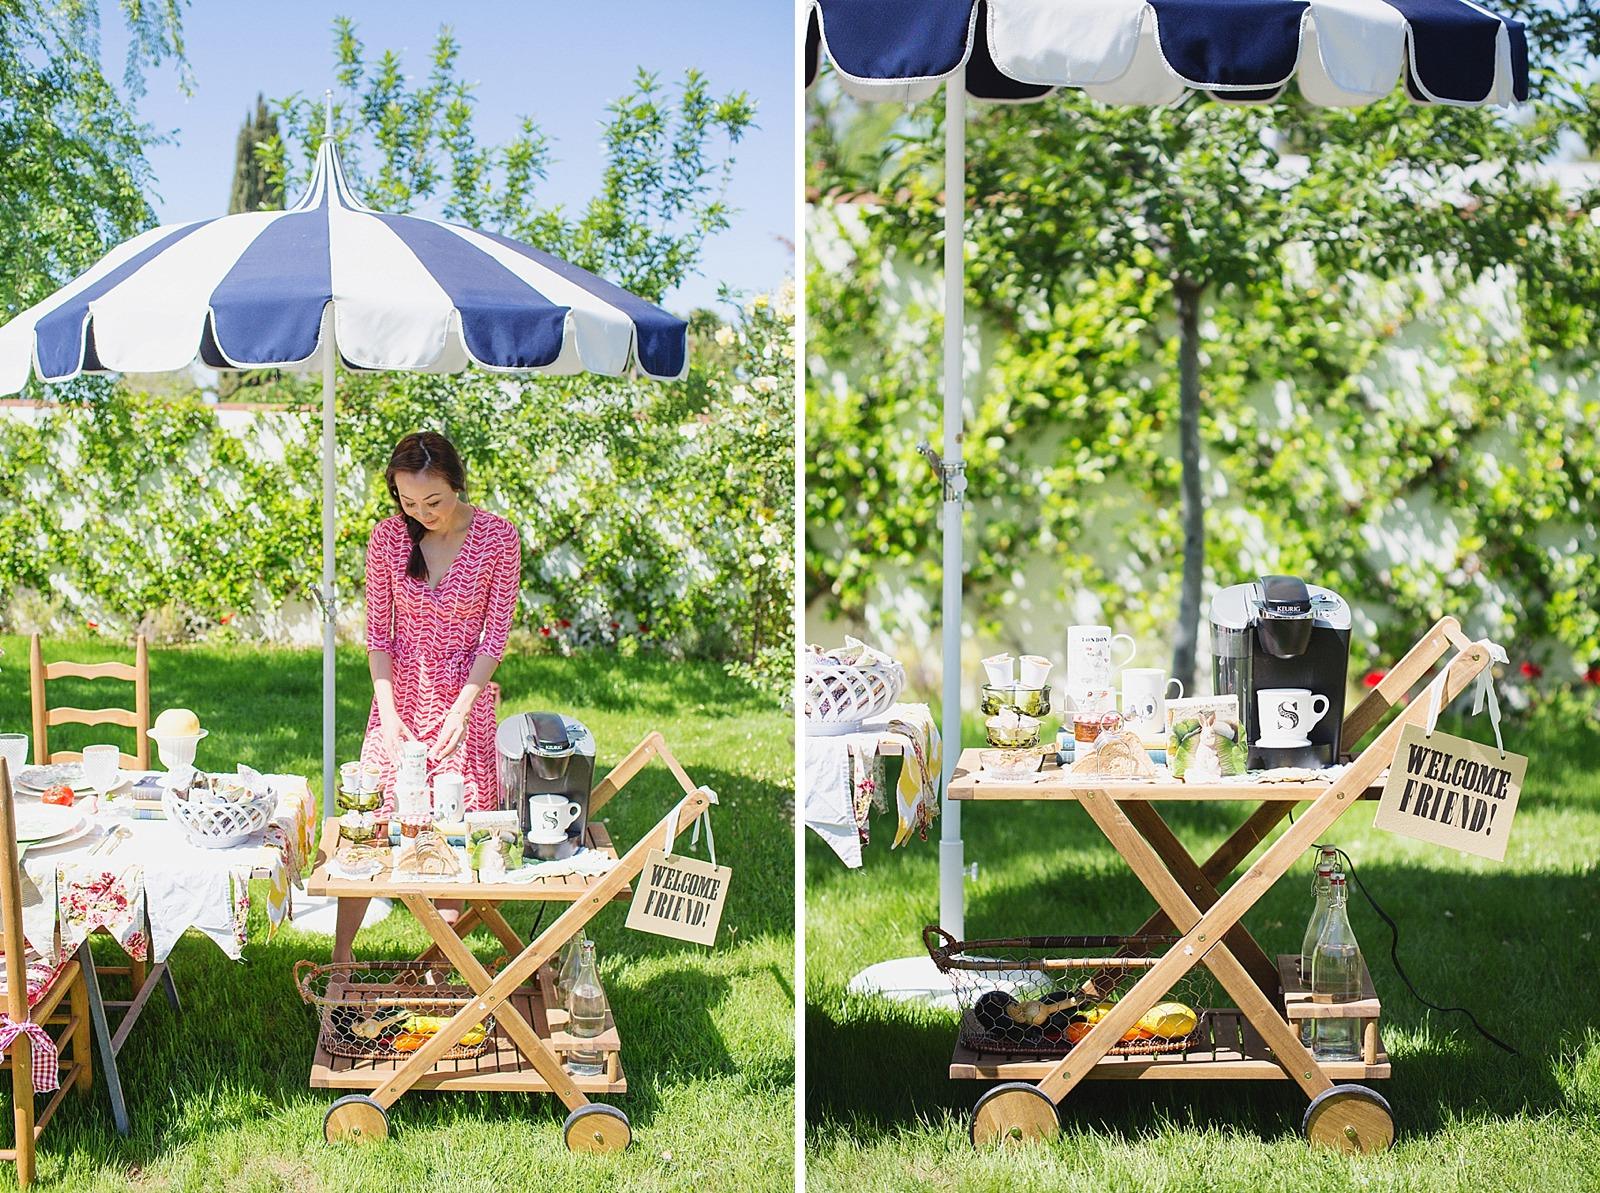 diana-elizabeth-blog-lifestyle-dunkin-creamers-dunkin-donuts-brunch-book-club--4425